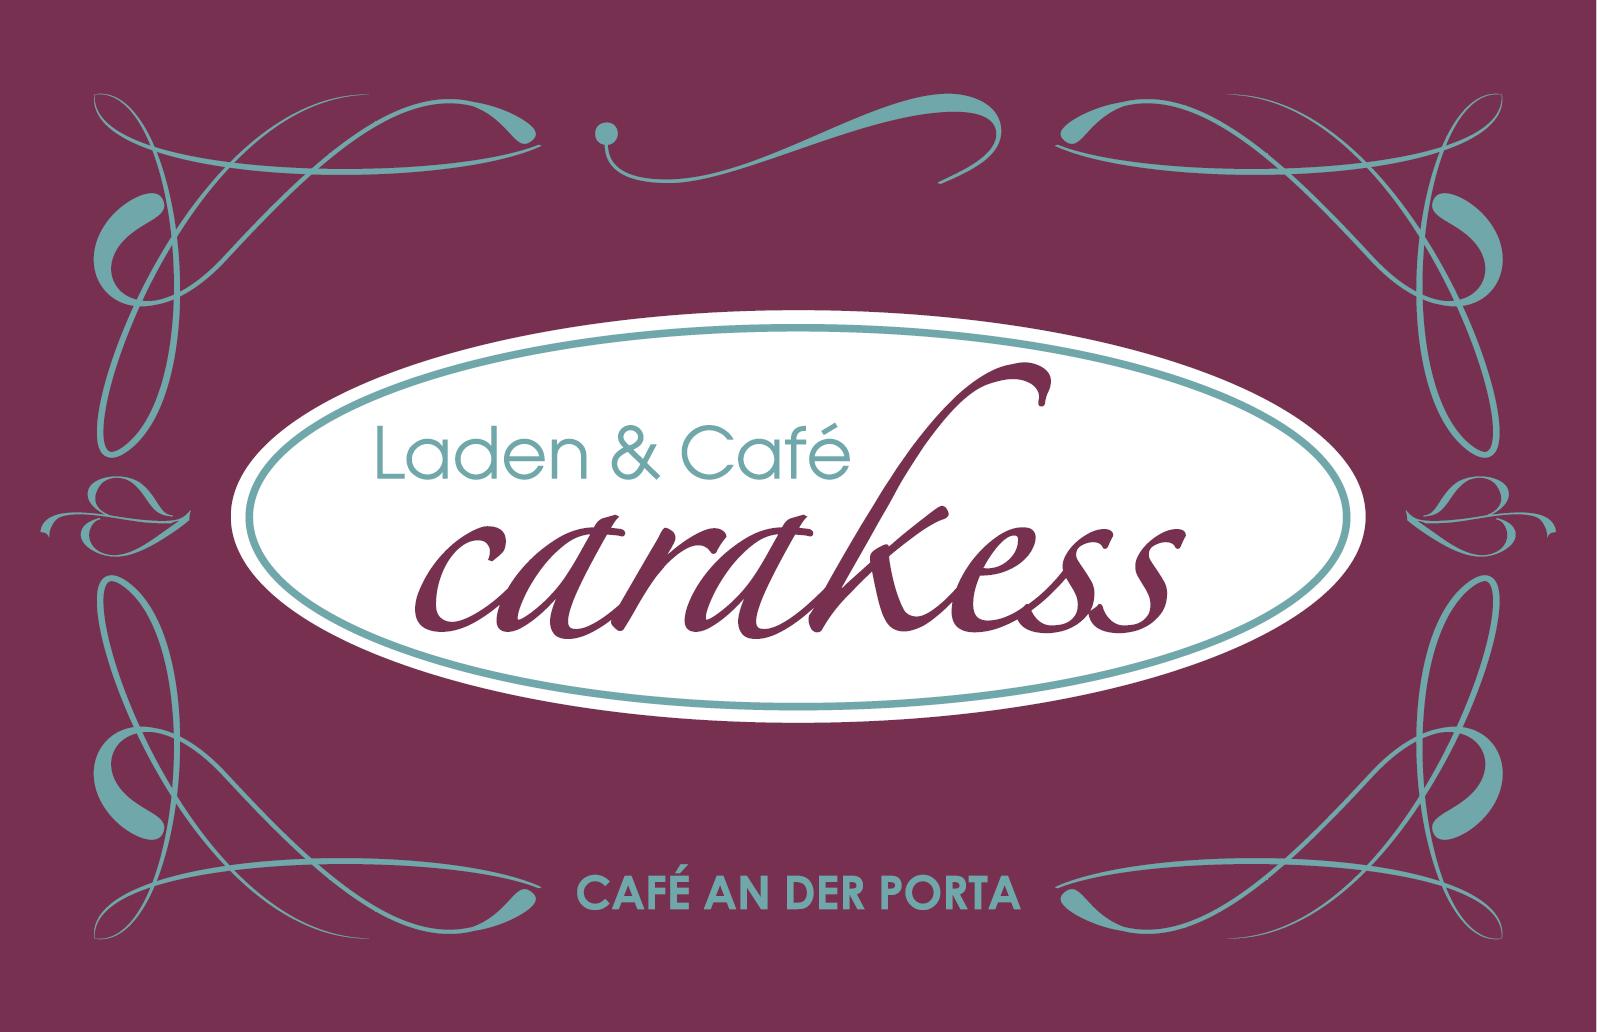 Carakess Shop Regensburg